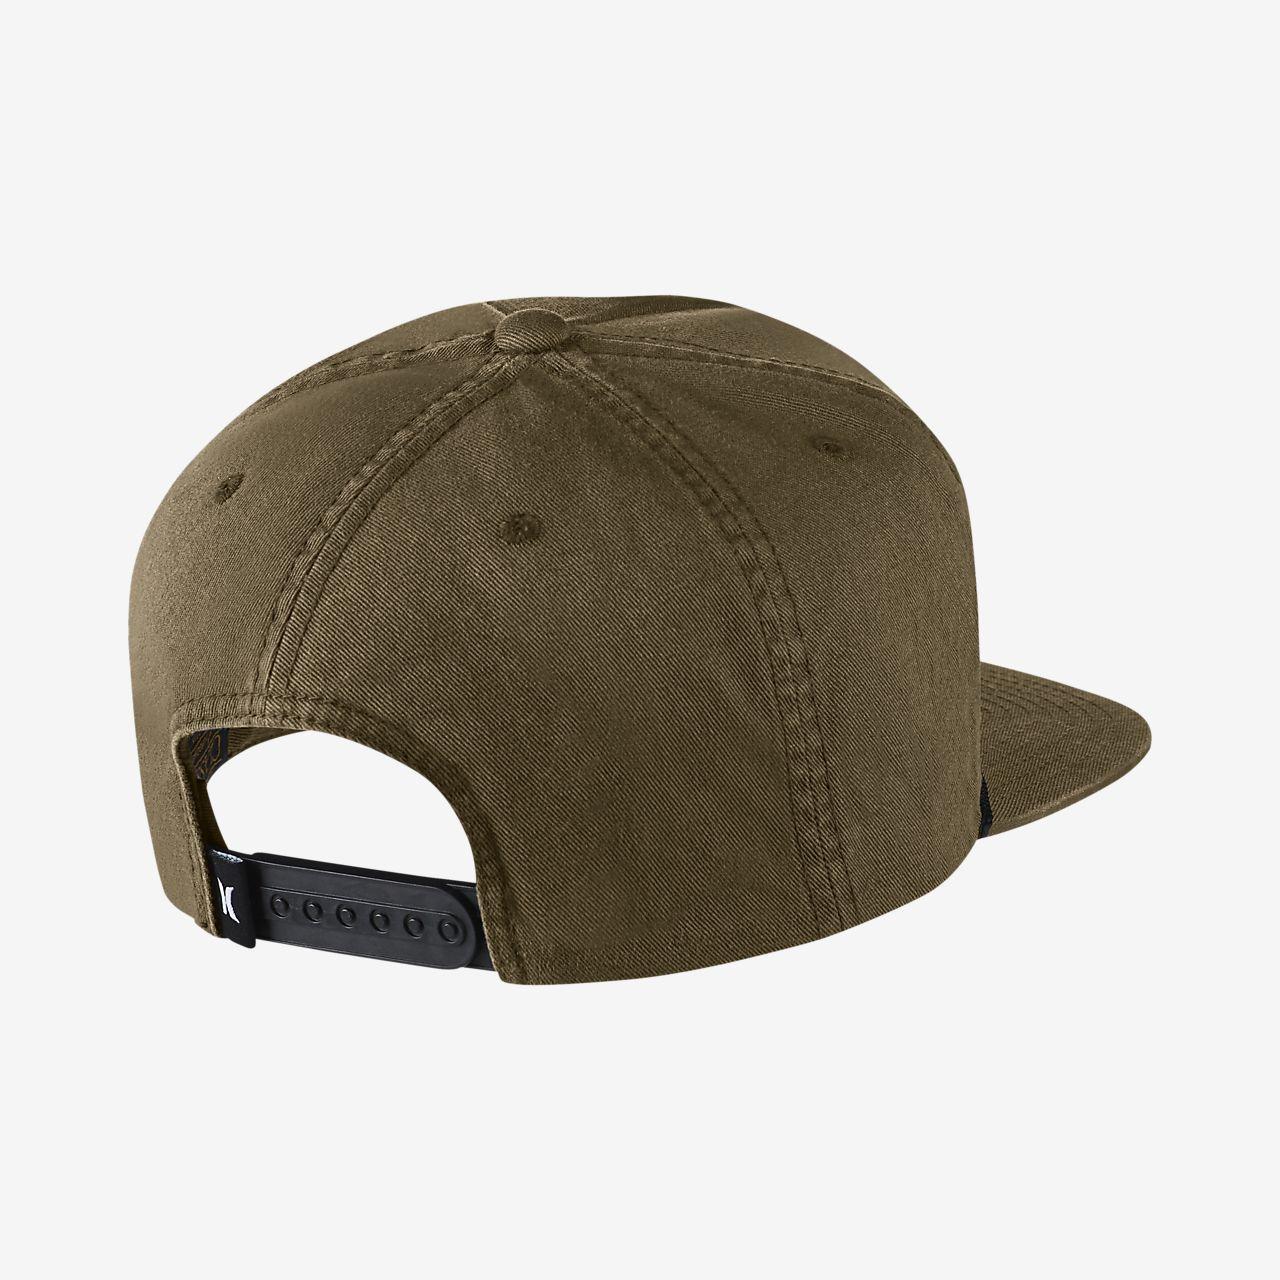 6eea5633f9c Hurley Corp Wash Men s Adjustable Hat. Nike.com NZ